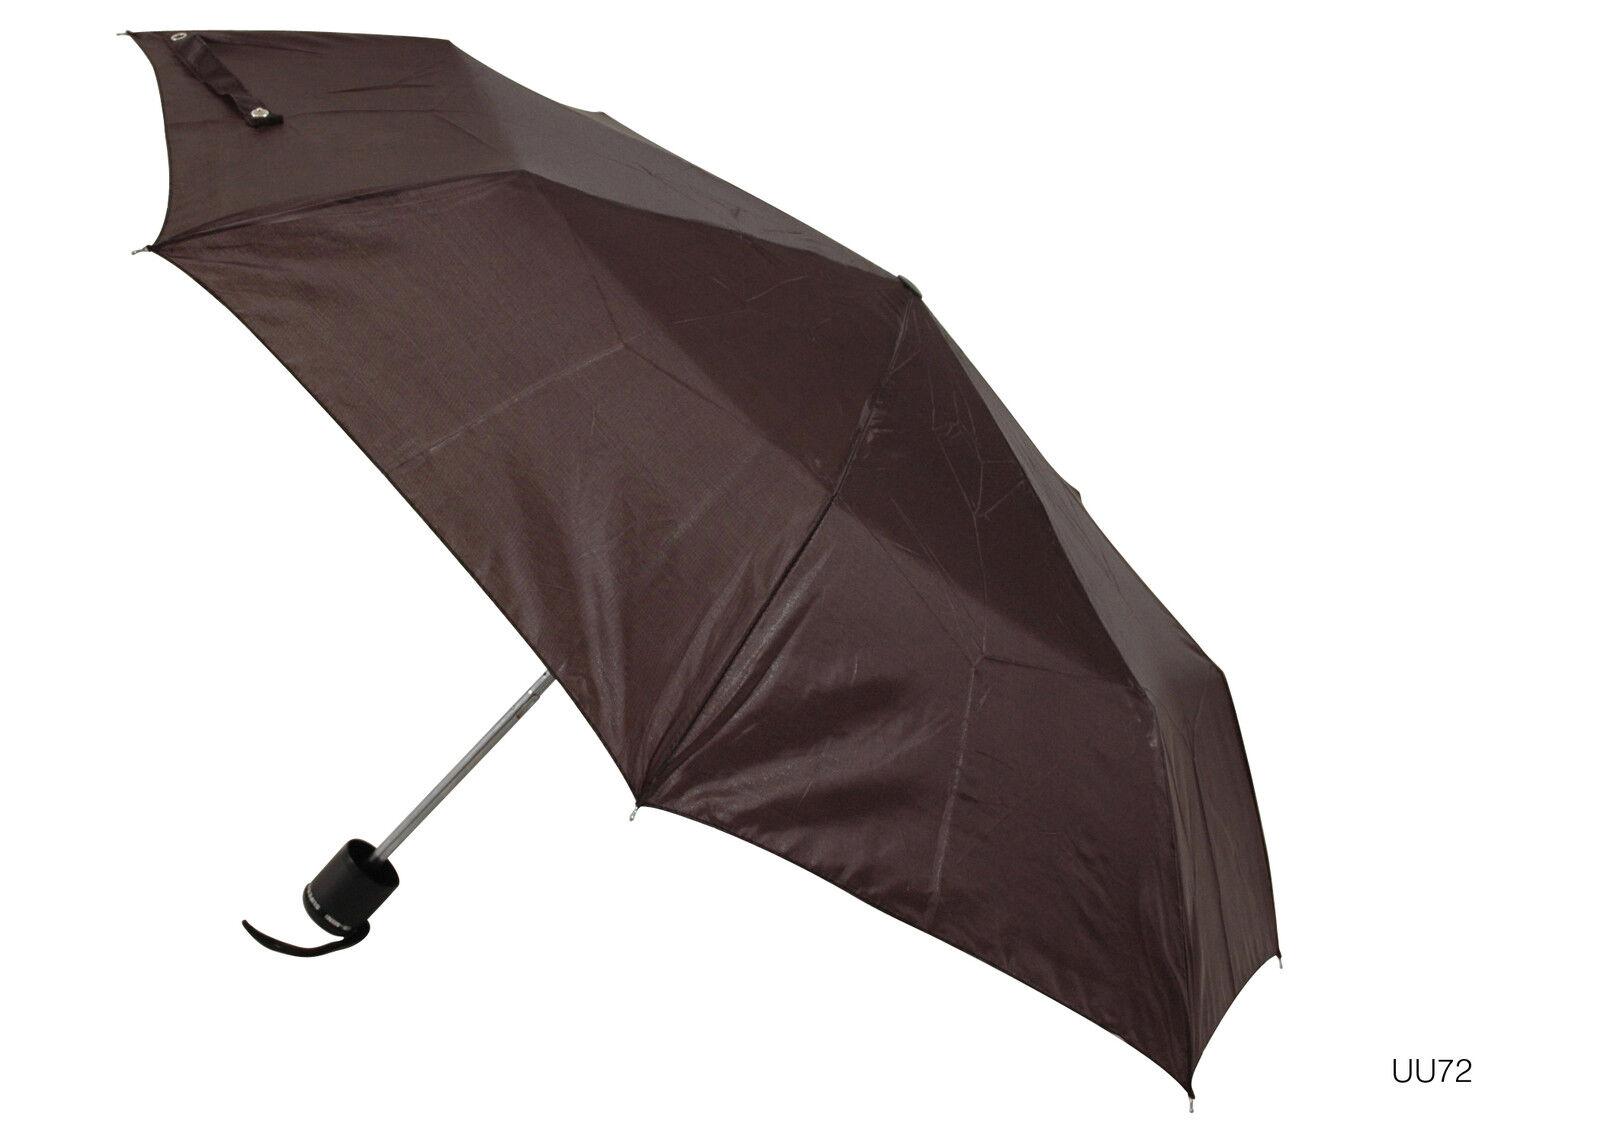 KS Brands UU0072 21 Inch Taslon Supermini Umbrella With Matching Sleeve Black